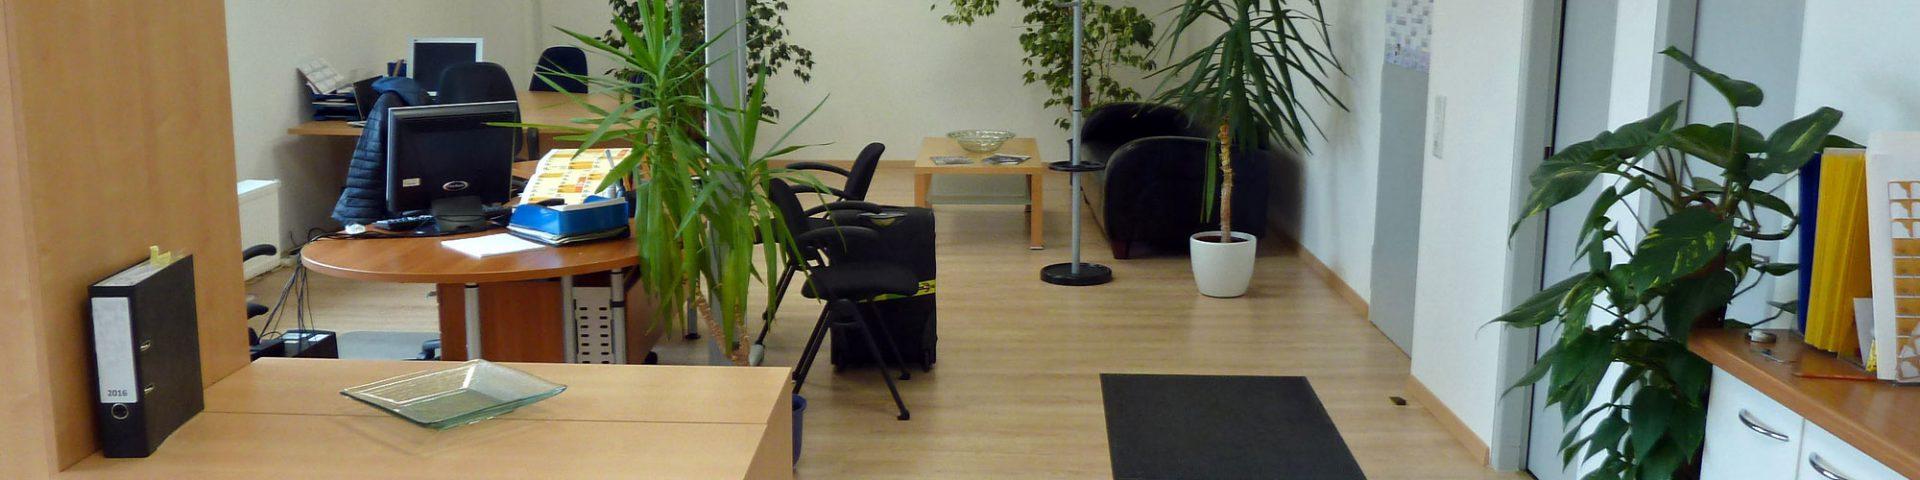 Mietobjekt Bürofläche Olchinger Hauptstraße - Großraumbüro